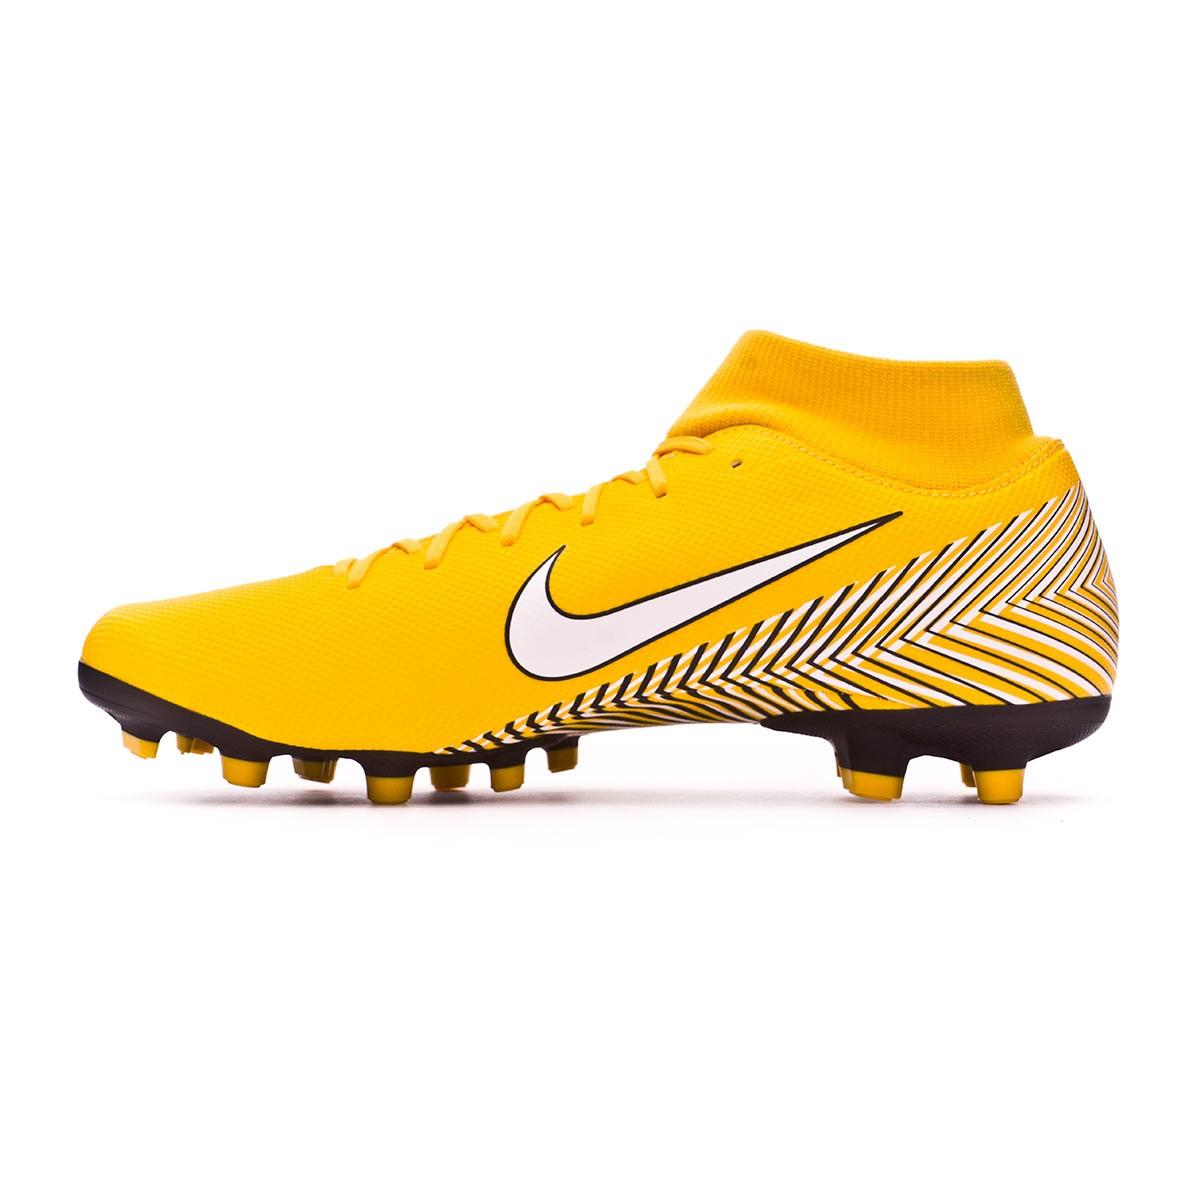 f16db93798f27 Football Boots Nike Mercurial Superfly VI Academy MG Neymar Yellow-Black -  Tienda de fútbol Fútbol Emotion